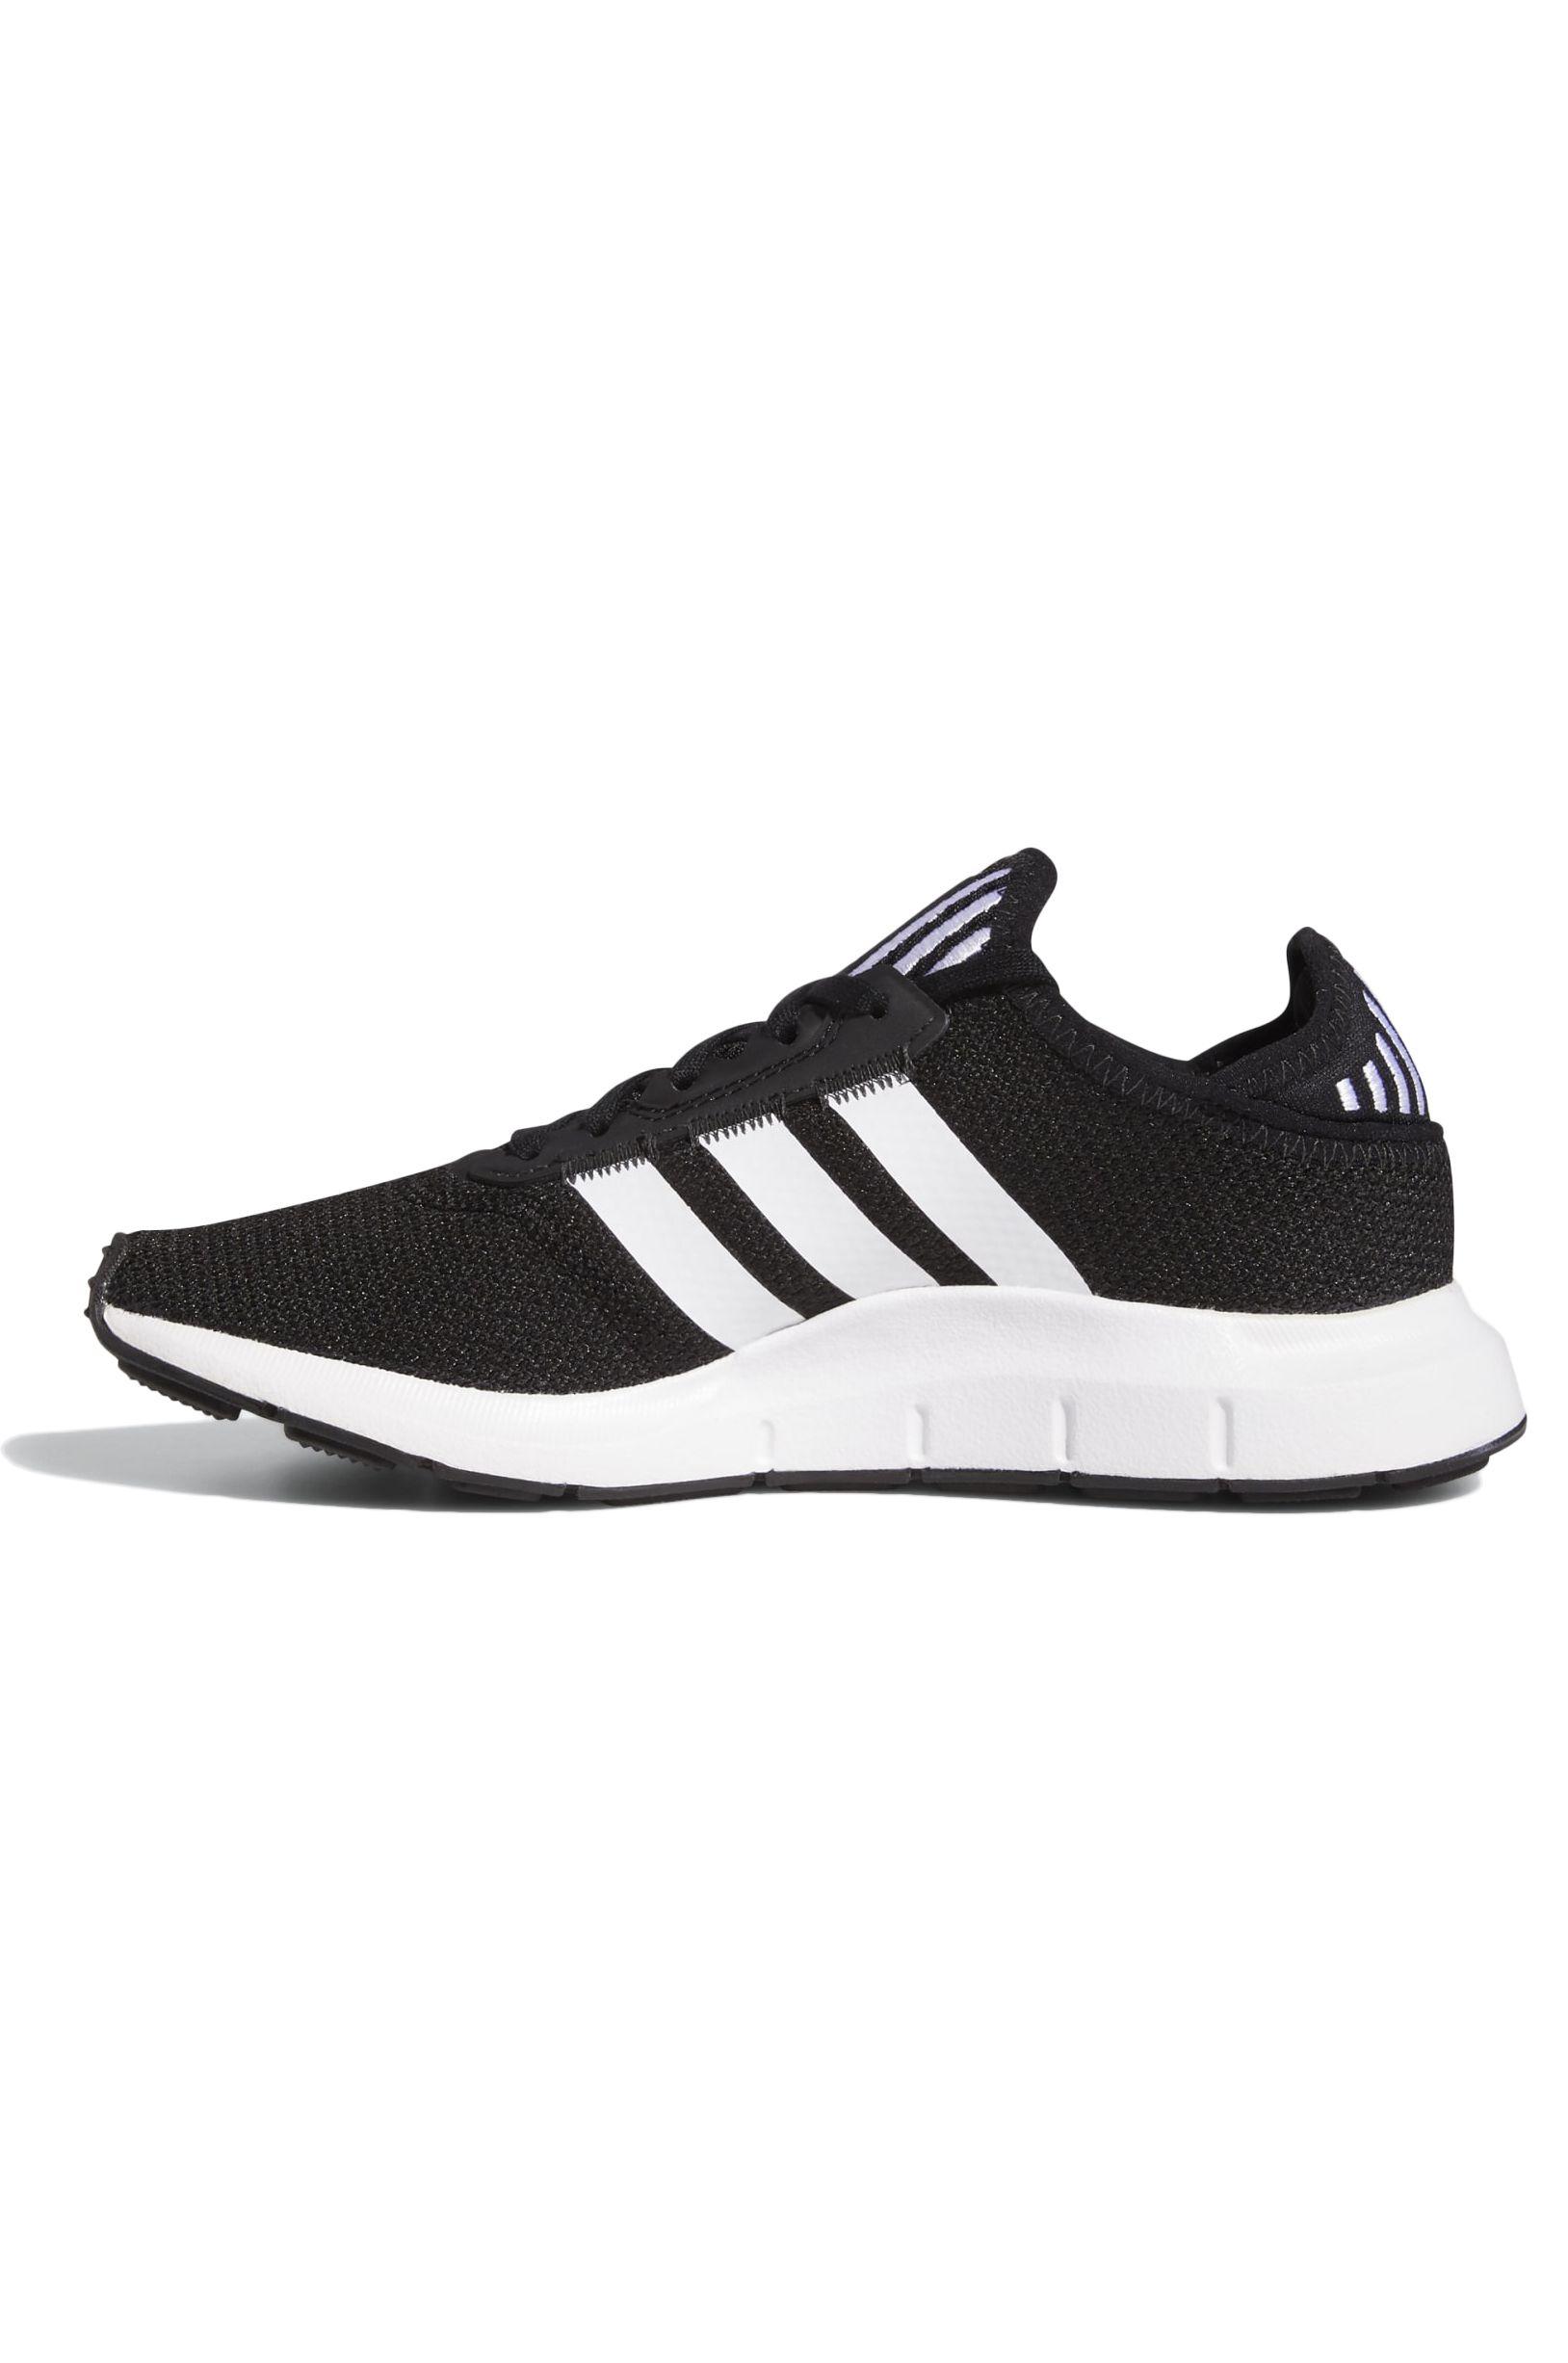 Tenis Adidas SWIFT RUN X J Core Black/Ftwr White/Core Black